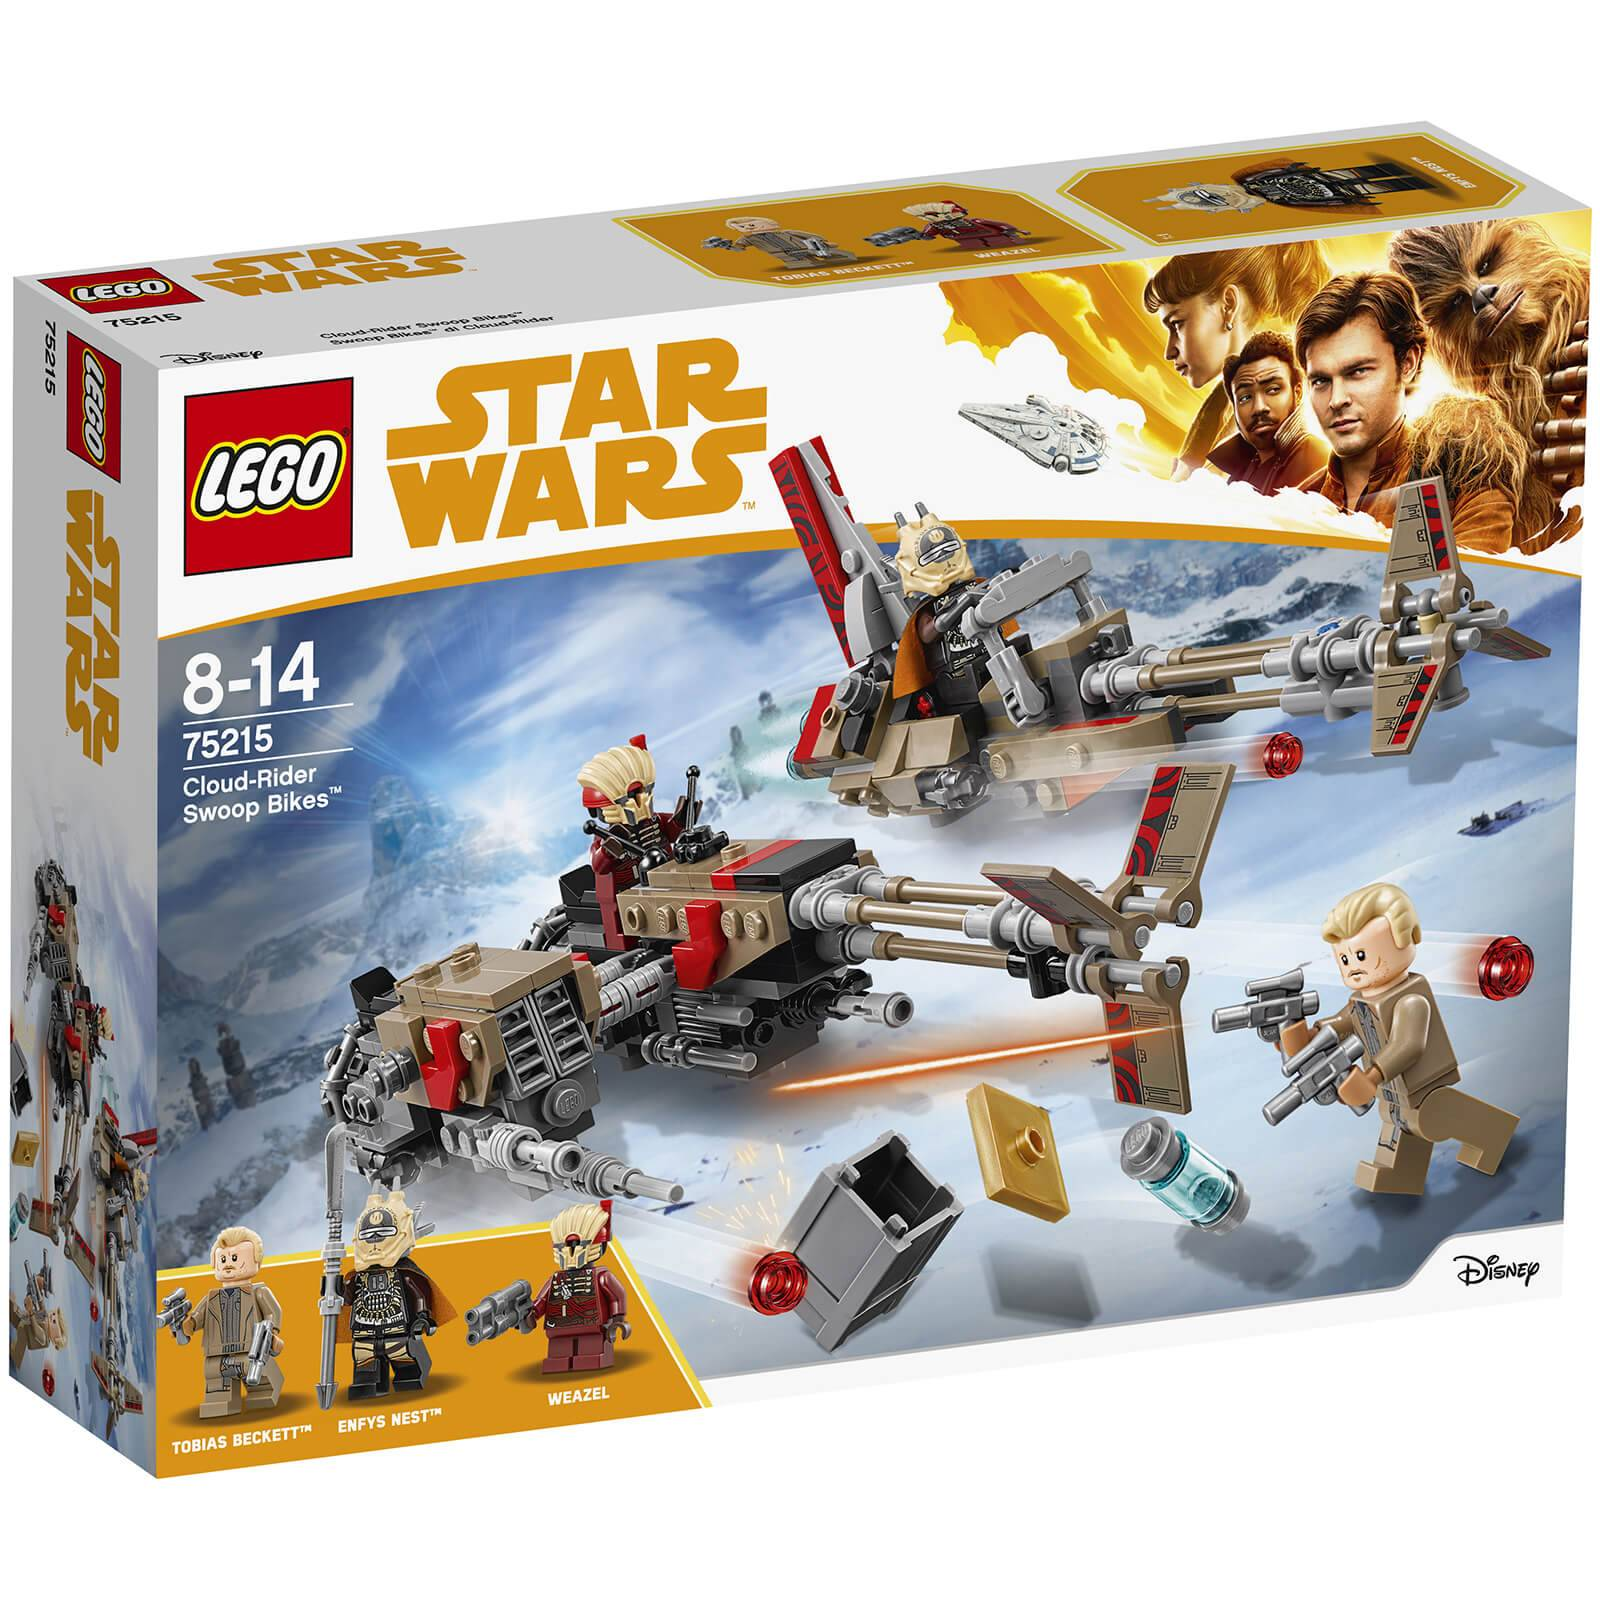 Lego Star Wars: Cloud-Rider Swoop Bikes (75215)